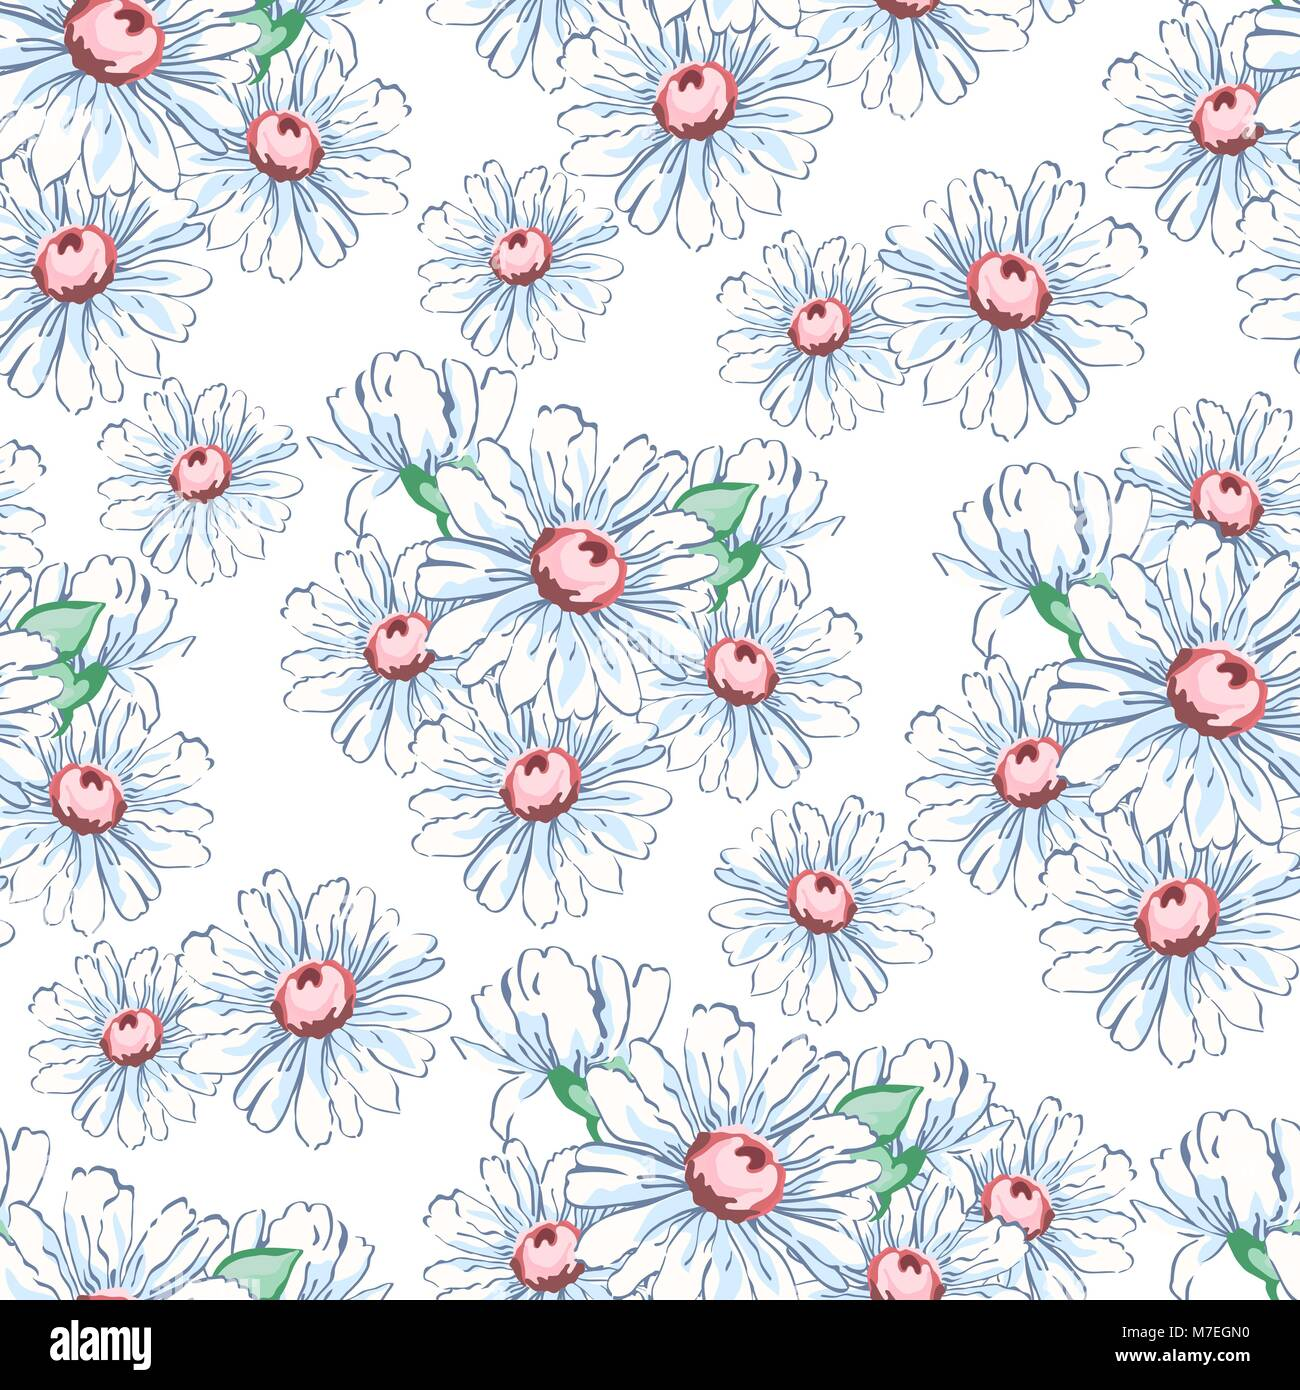 Floral Wallpapers Imágenes De Stock & Floral Wallpapers Fotos De ...